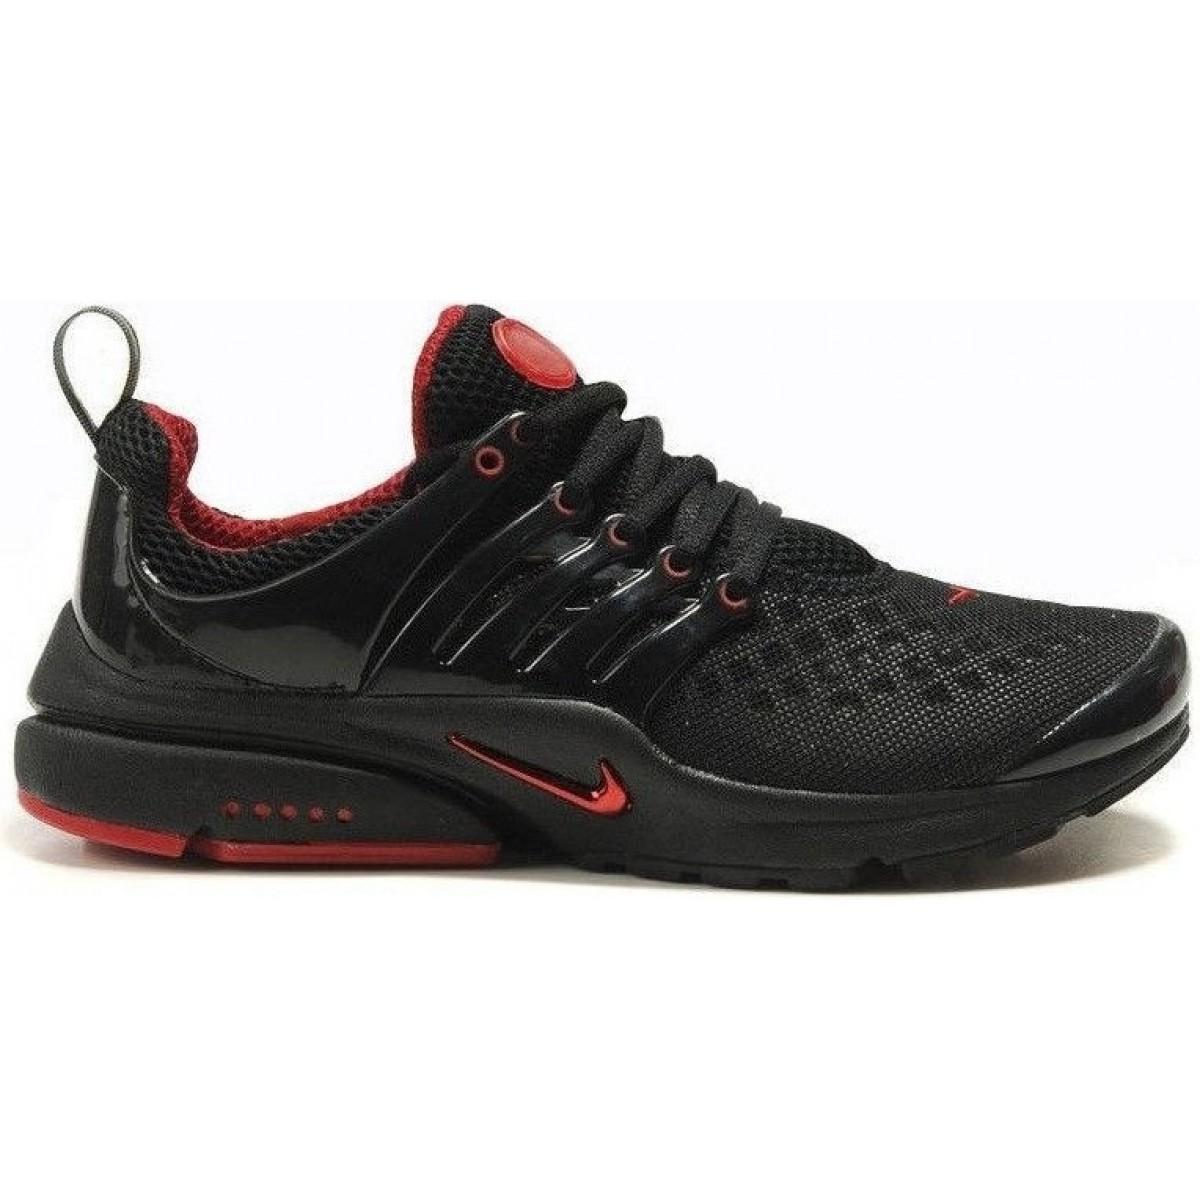 Nike Air Presto 'Black Red' 848187-703